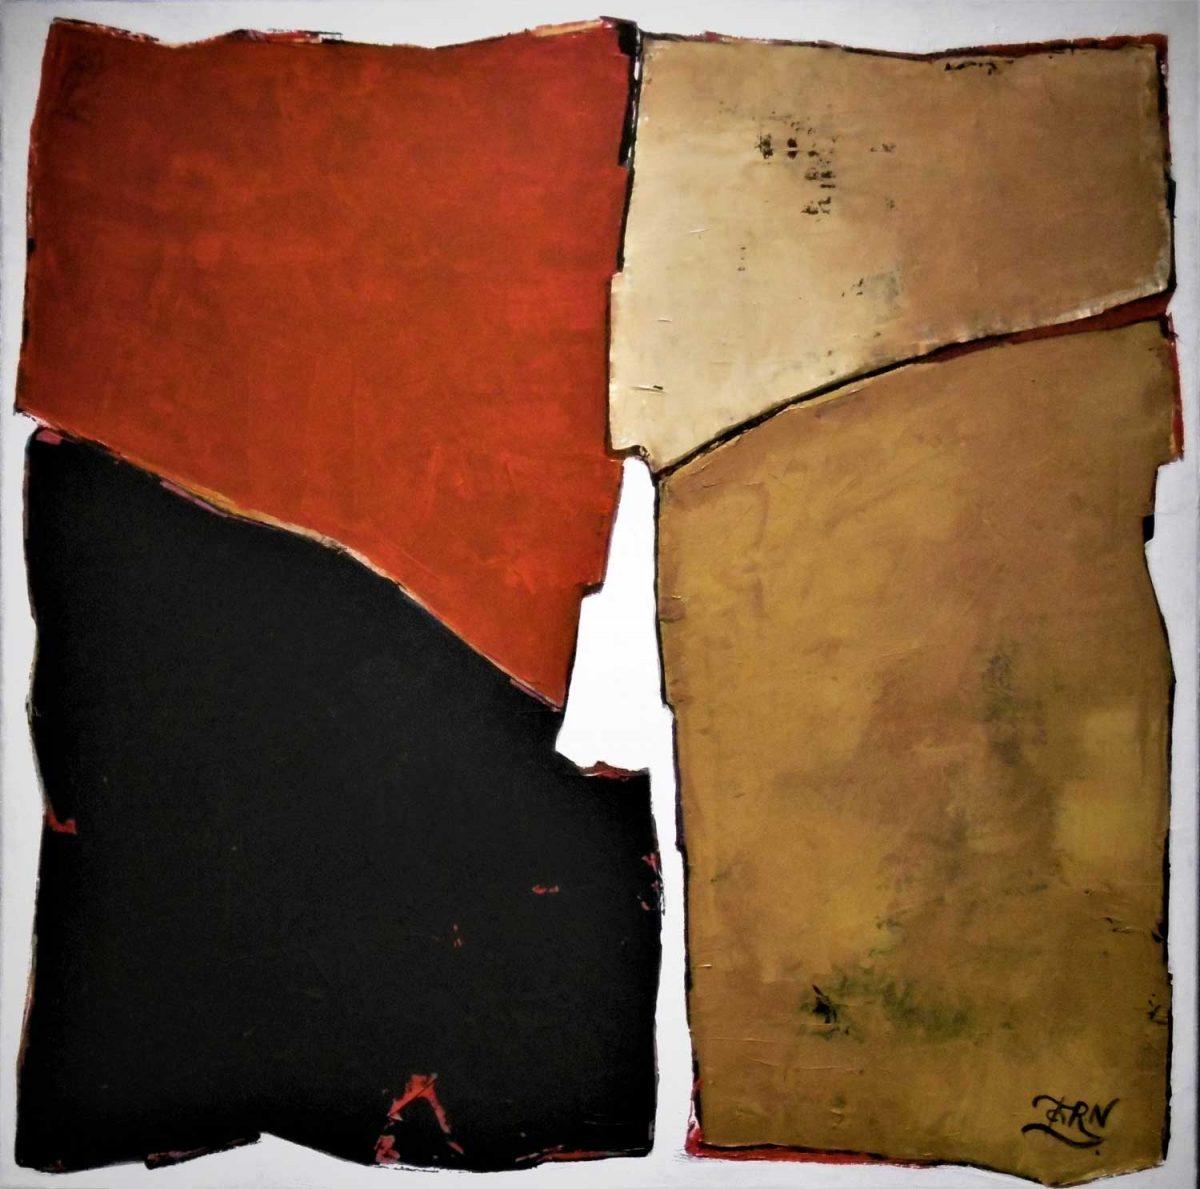 Chilida, Expressionistich Abstract, Wim Zorn Kunstenaar